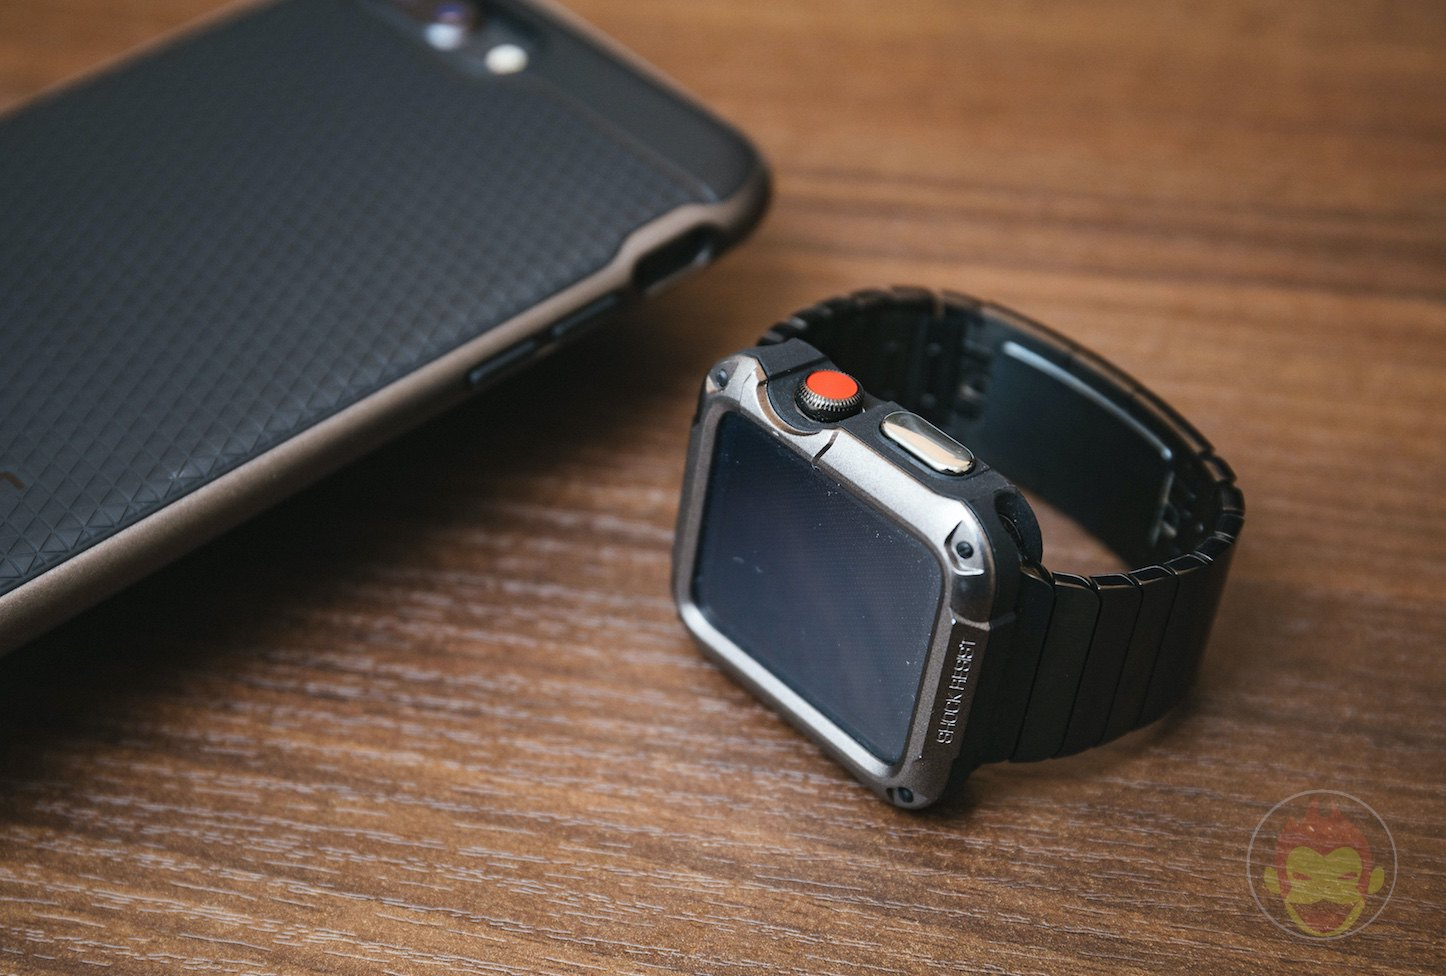 Spigen-Touch-Armor-Apple-Watch-Case-09.jpg